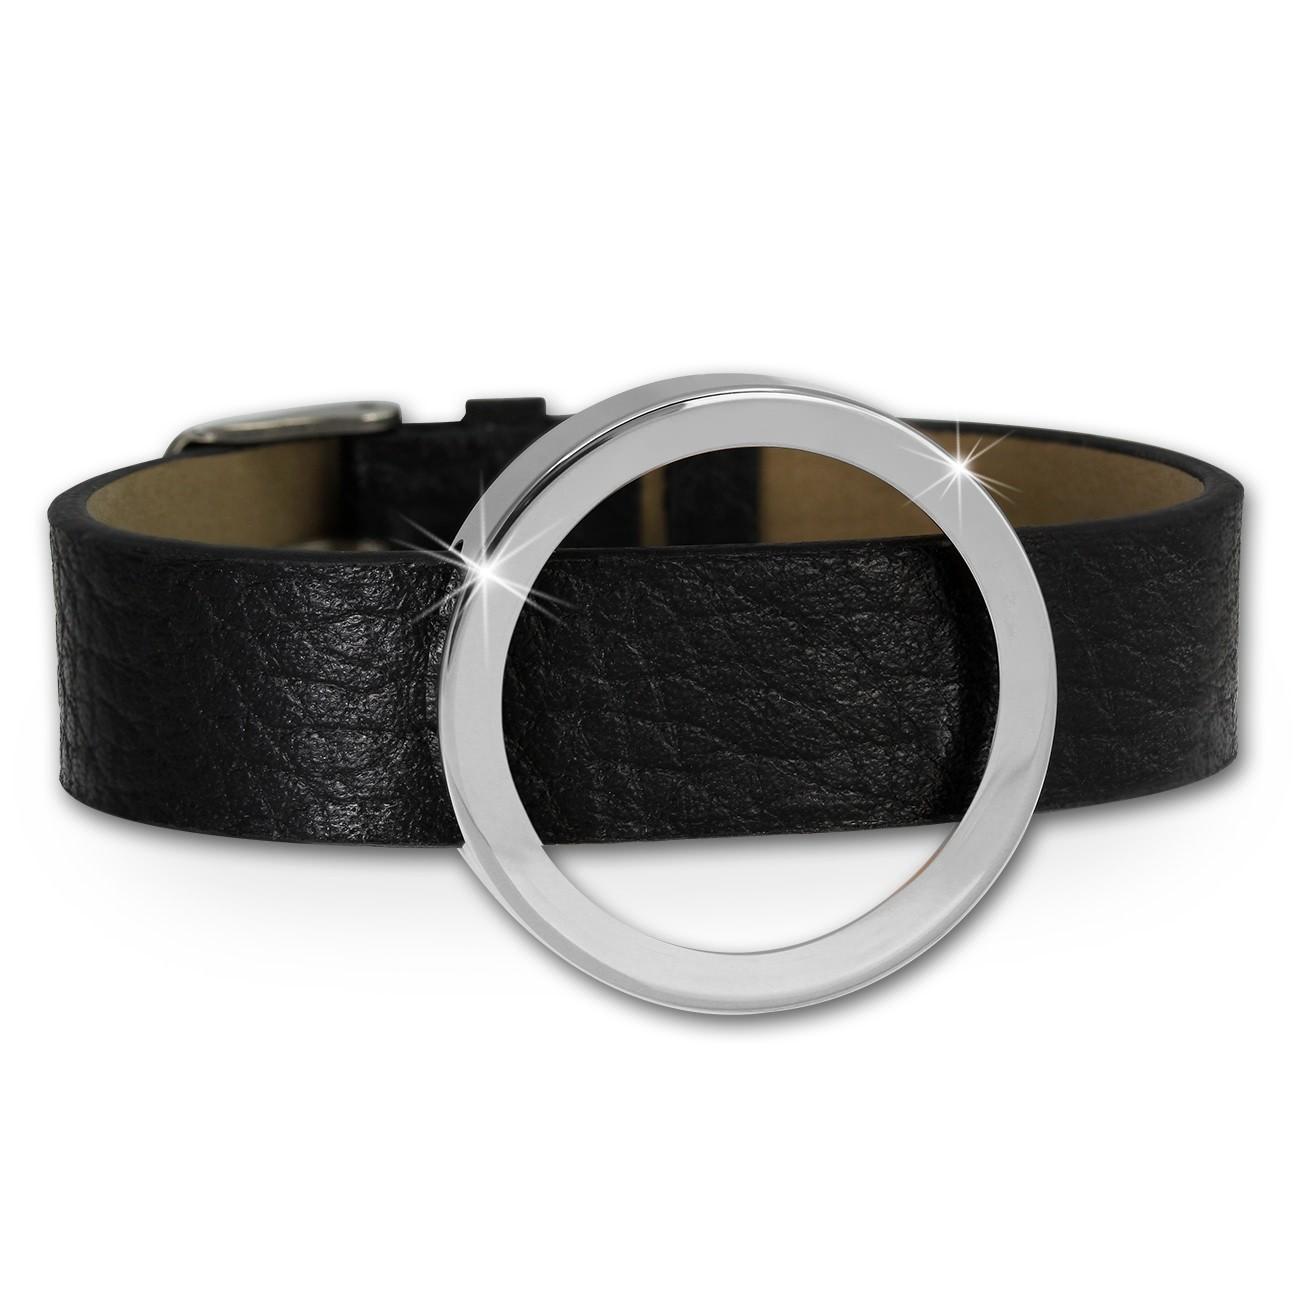 Amello Leder Armband mit Coin Fassung 30mm silber Edelstahlschmuck ESCA08J